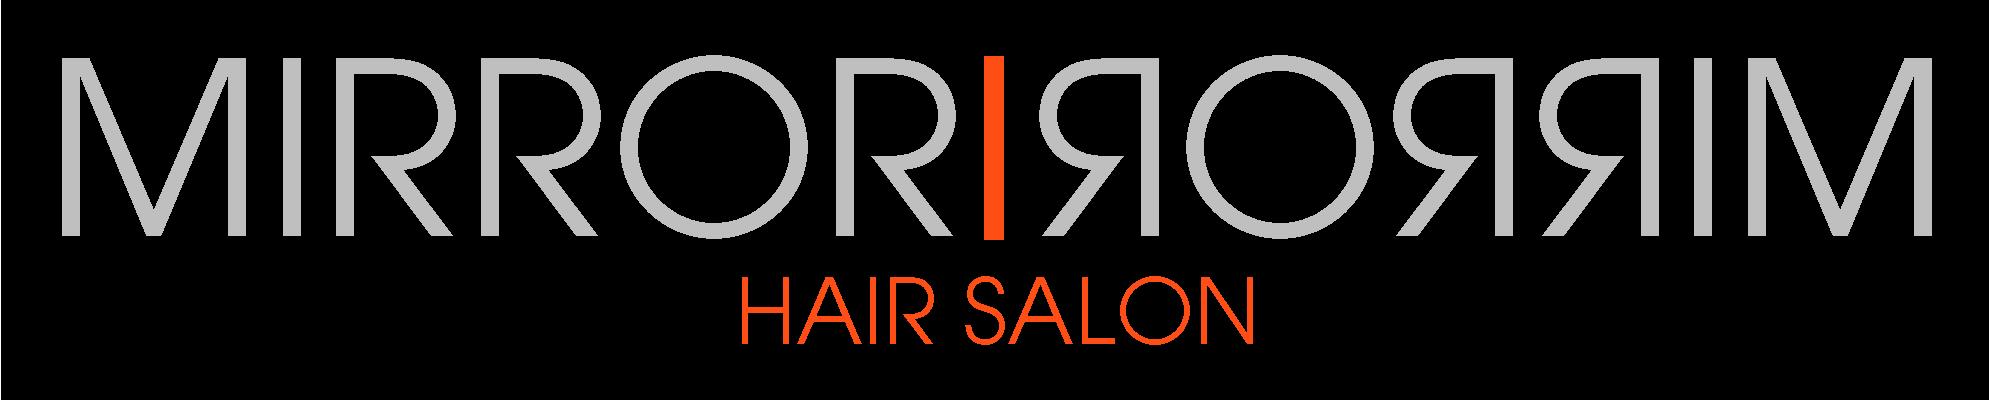 Mirror Mirror logo .jpg